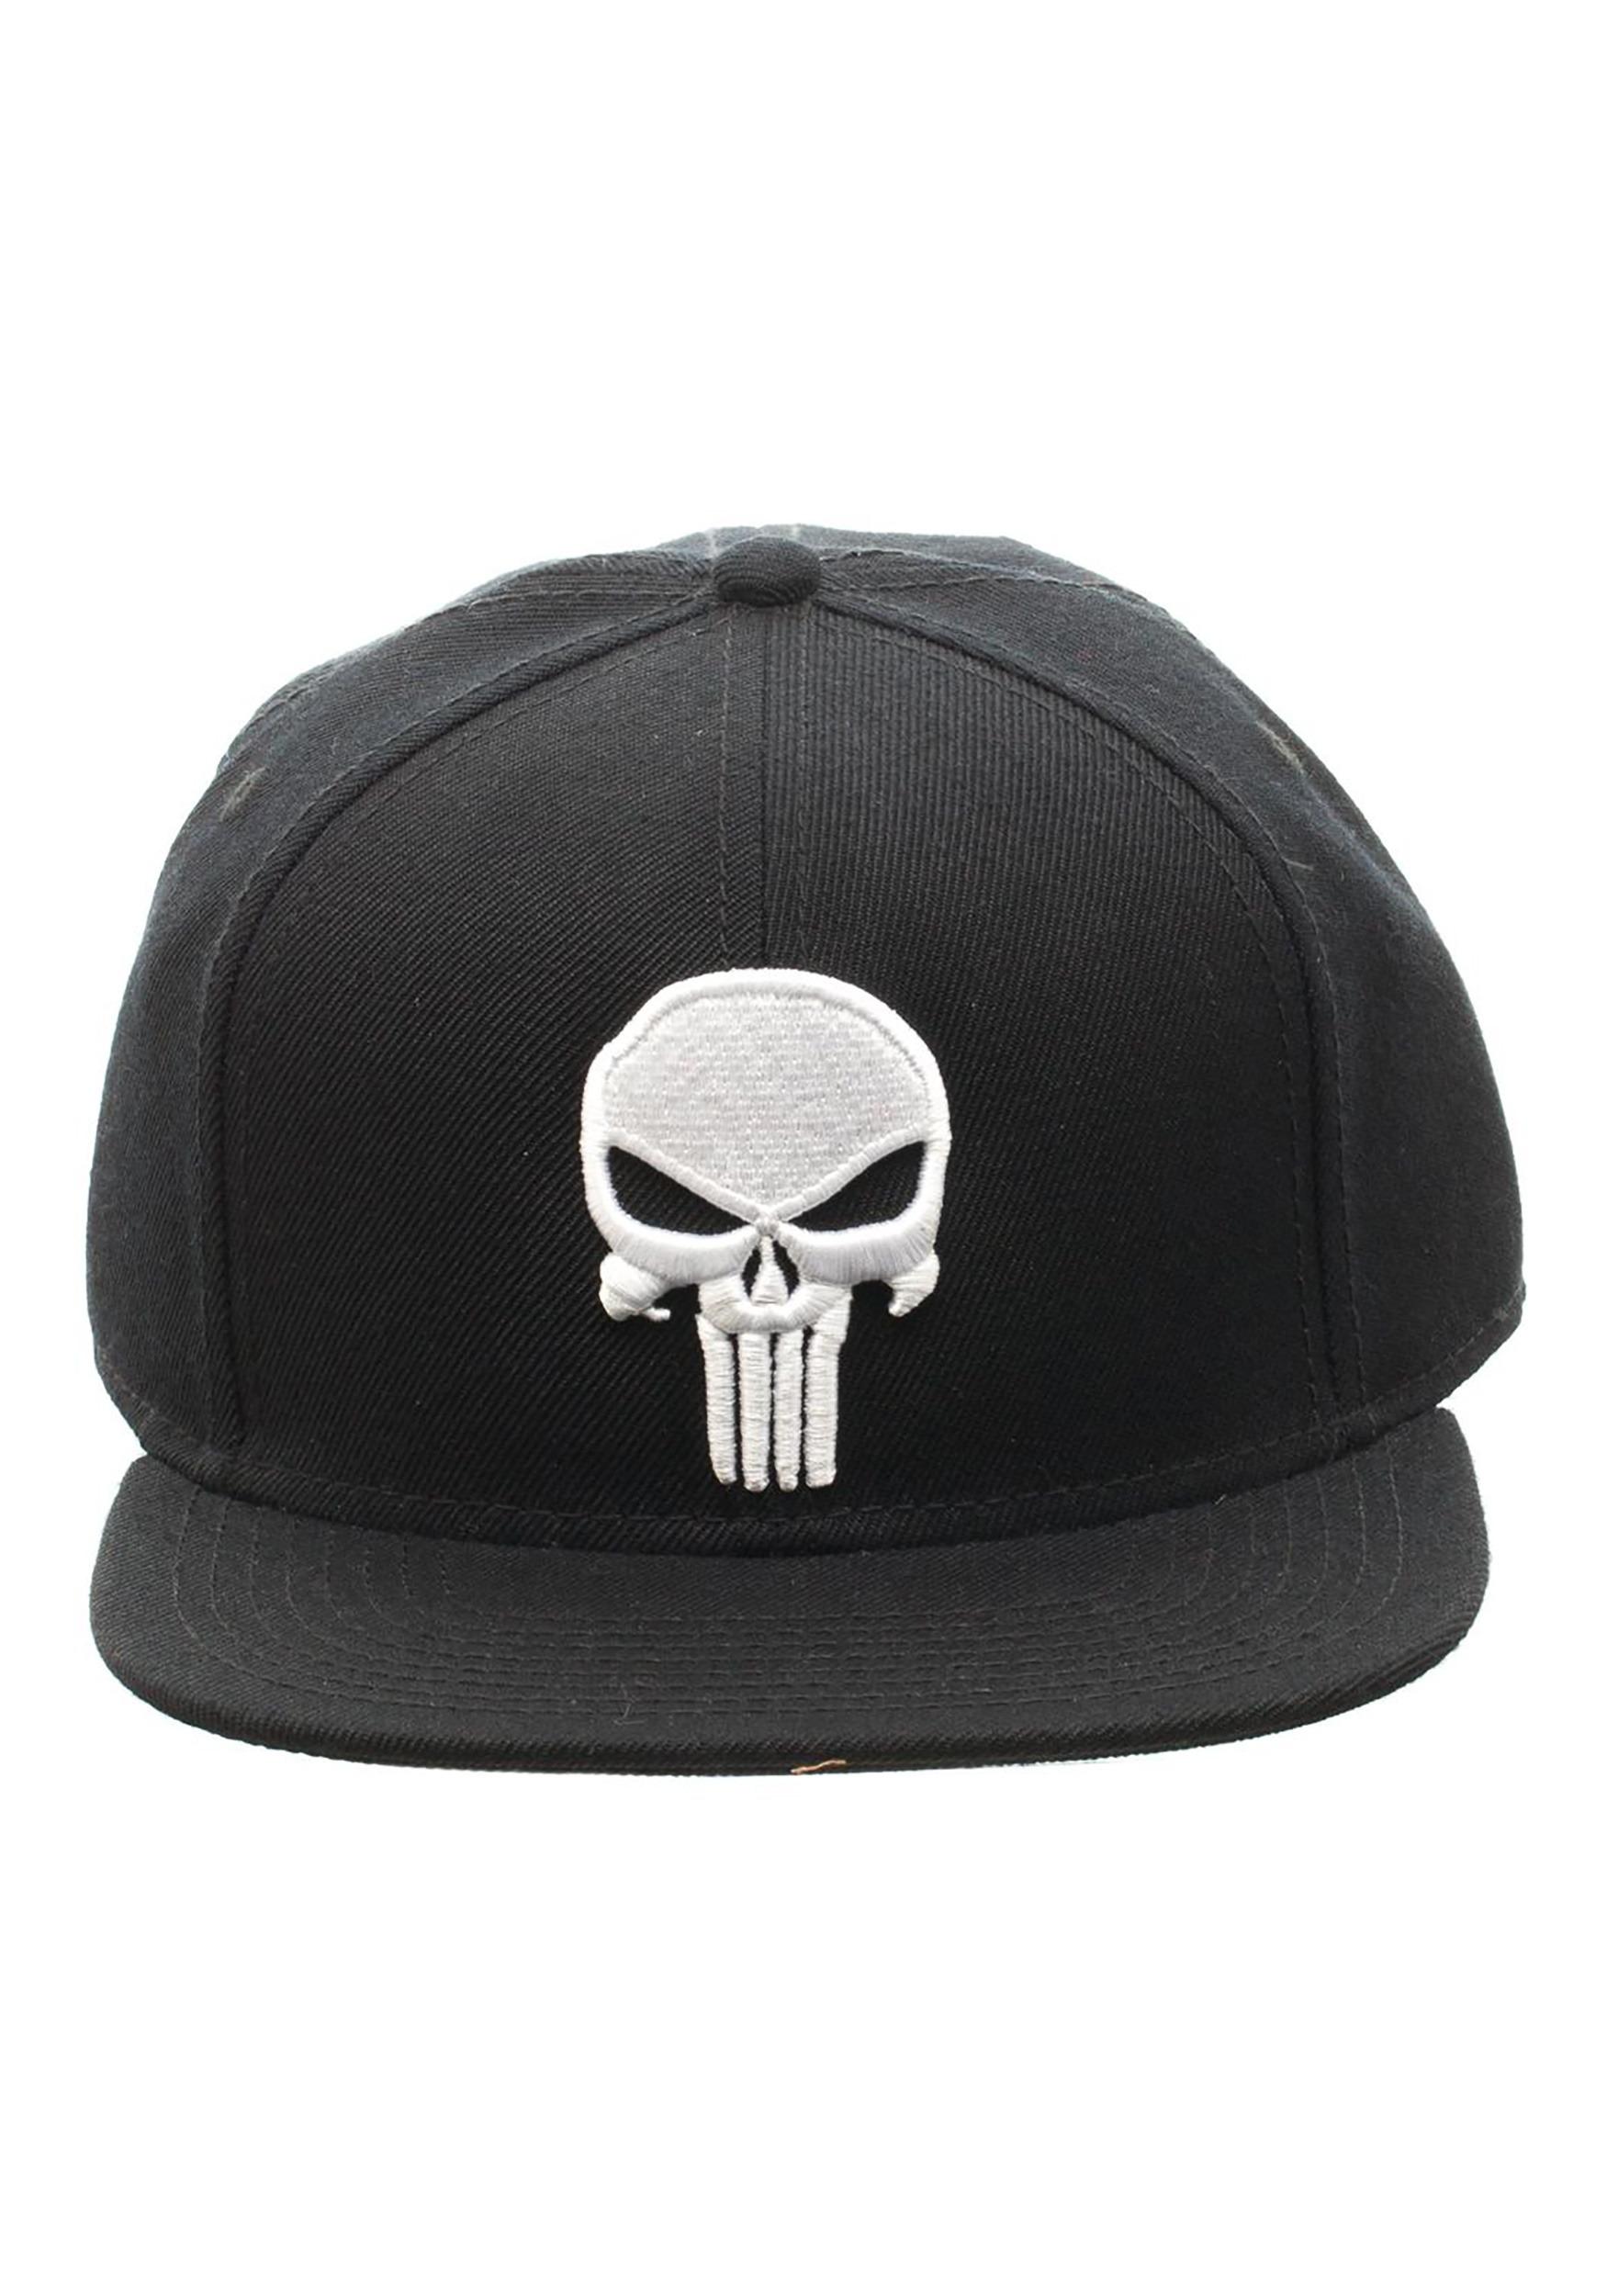 c5eb4f5e7ec Punisher Logo Snap Back Hat Update1